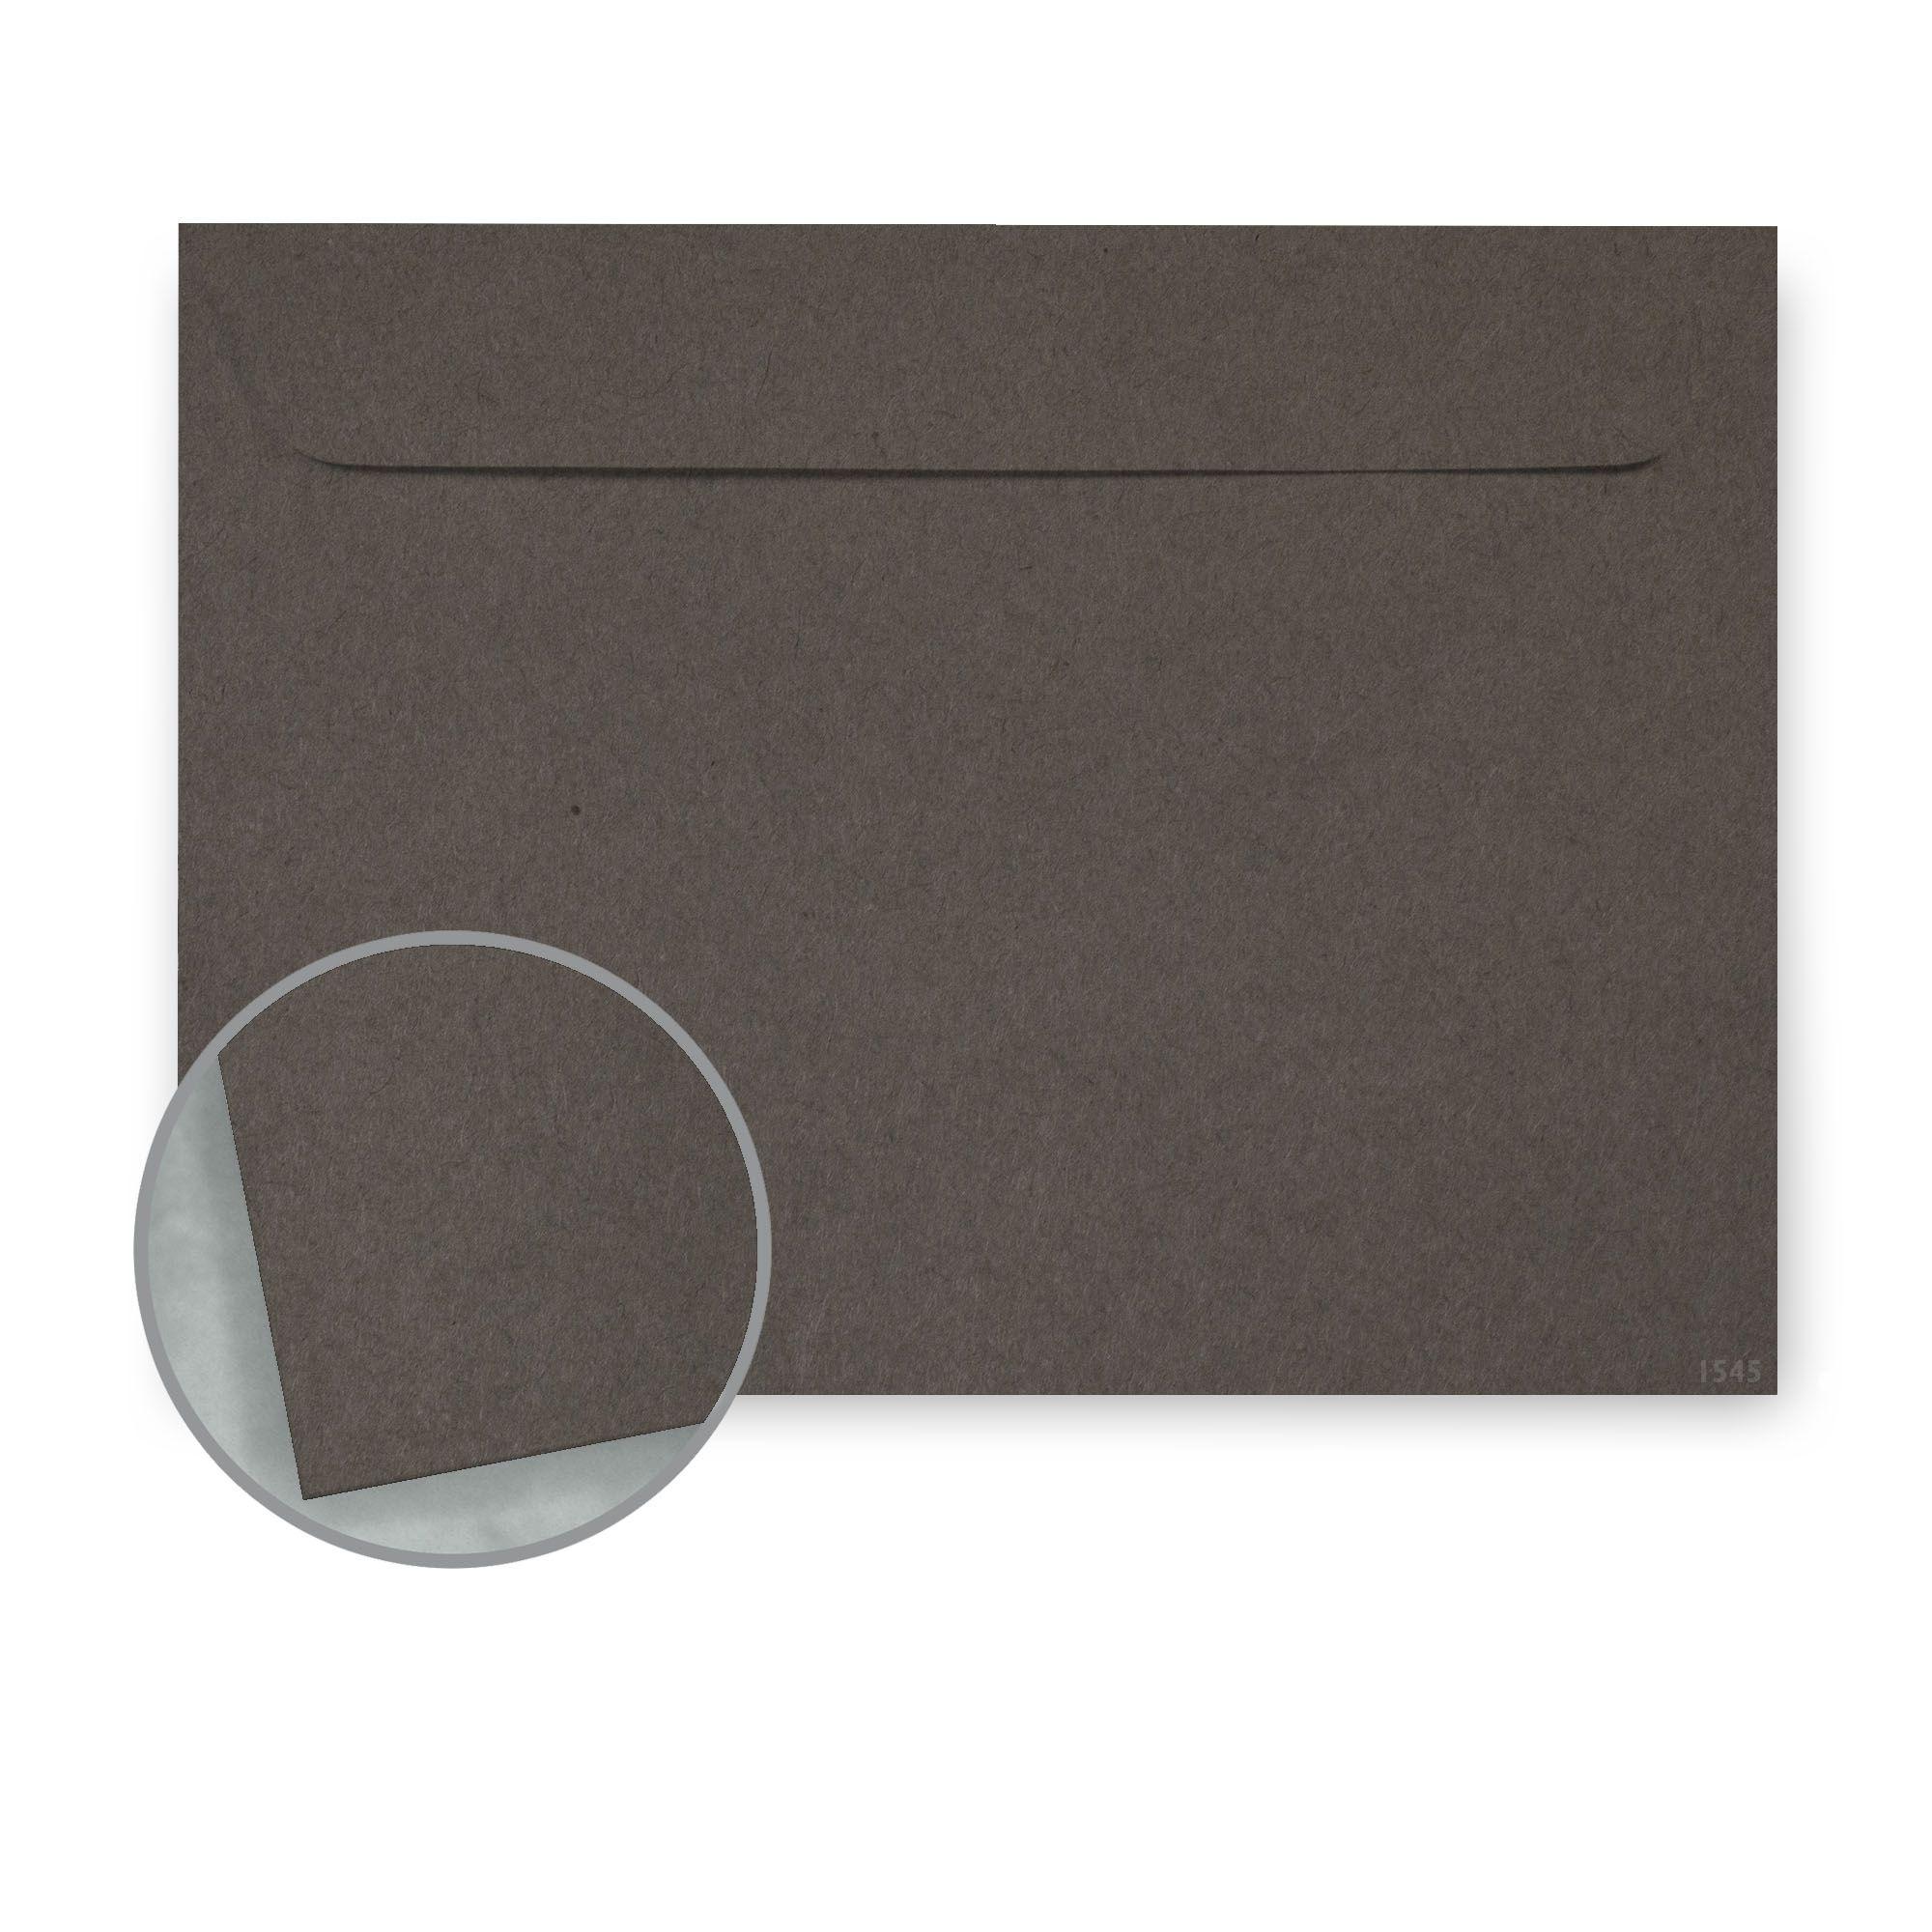 "100 Envelopes Envelope 6/"" X 9/"" White"